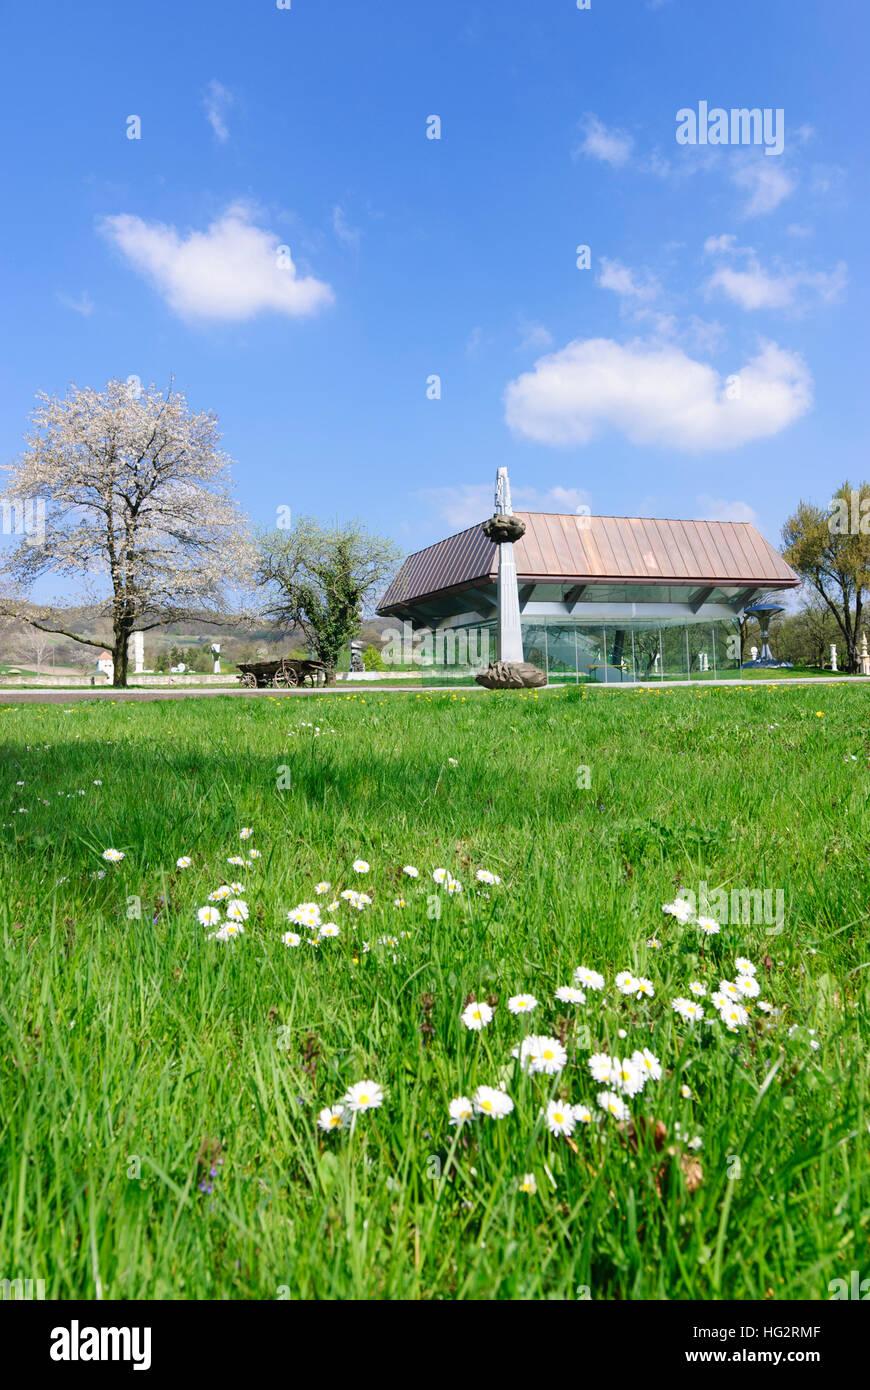 Winden am See: Wander Bertoni open air museum, , Burgenland, Austria - Stock Image